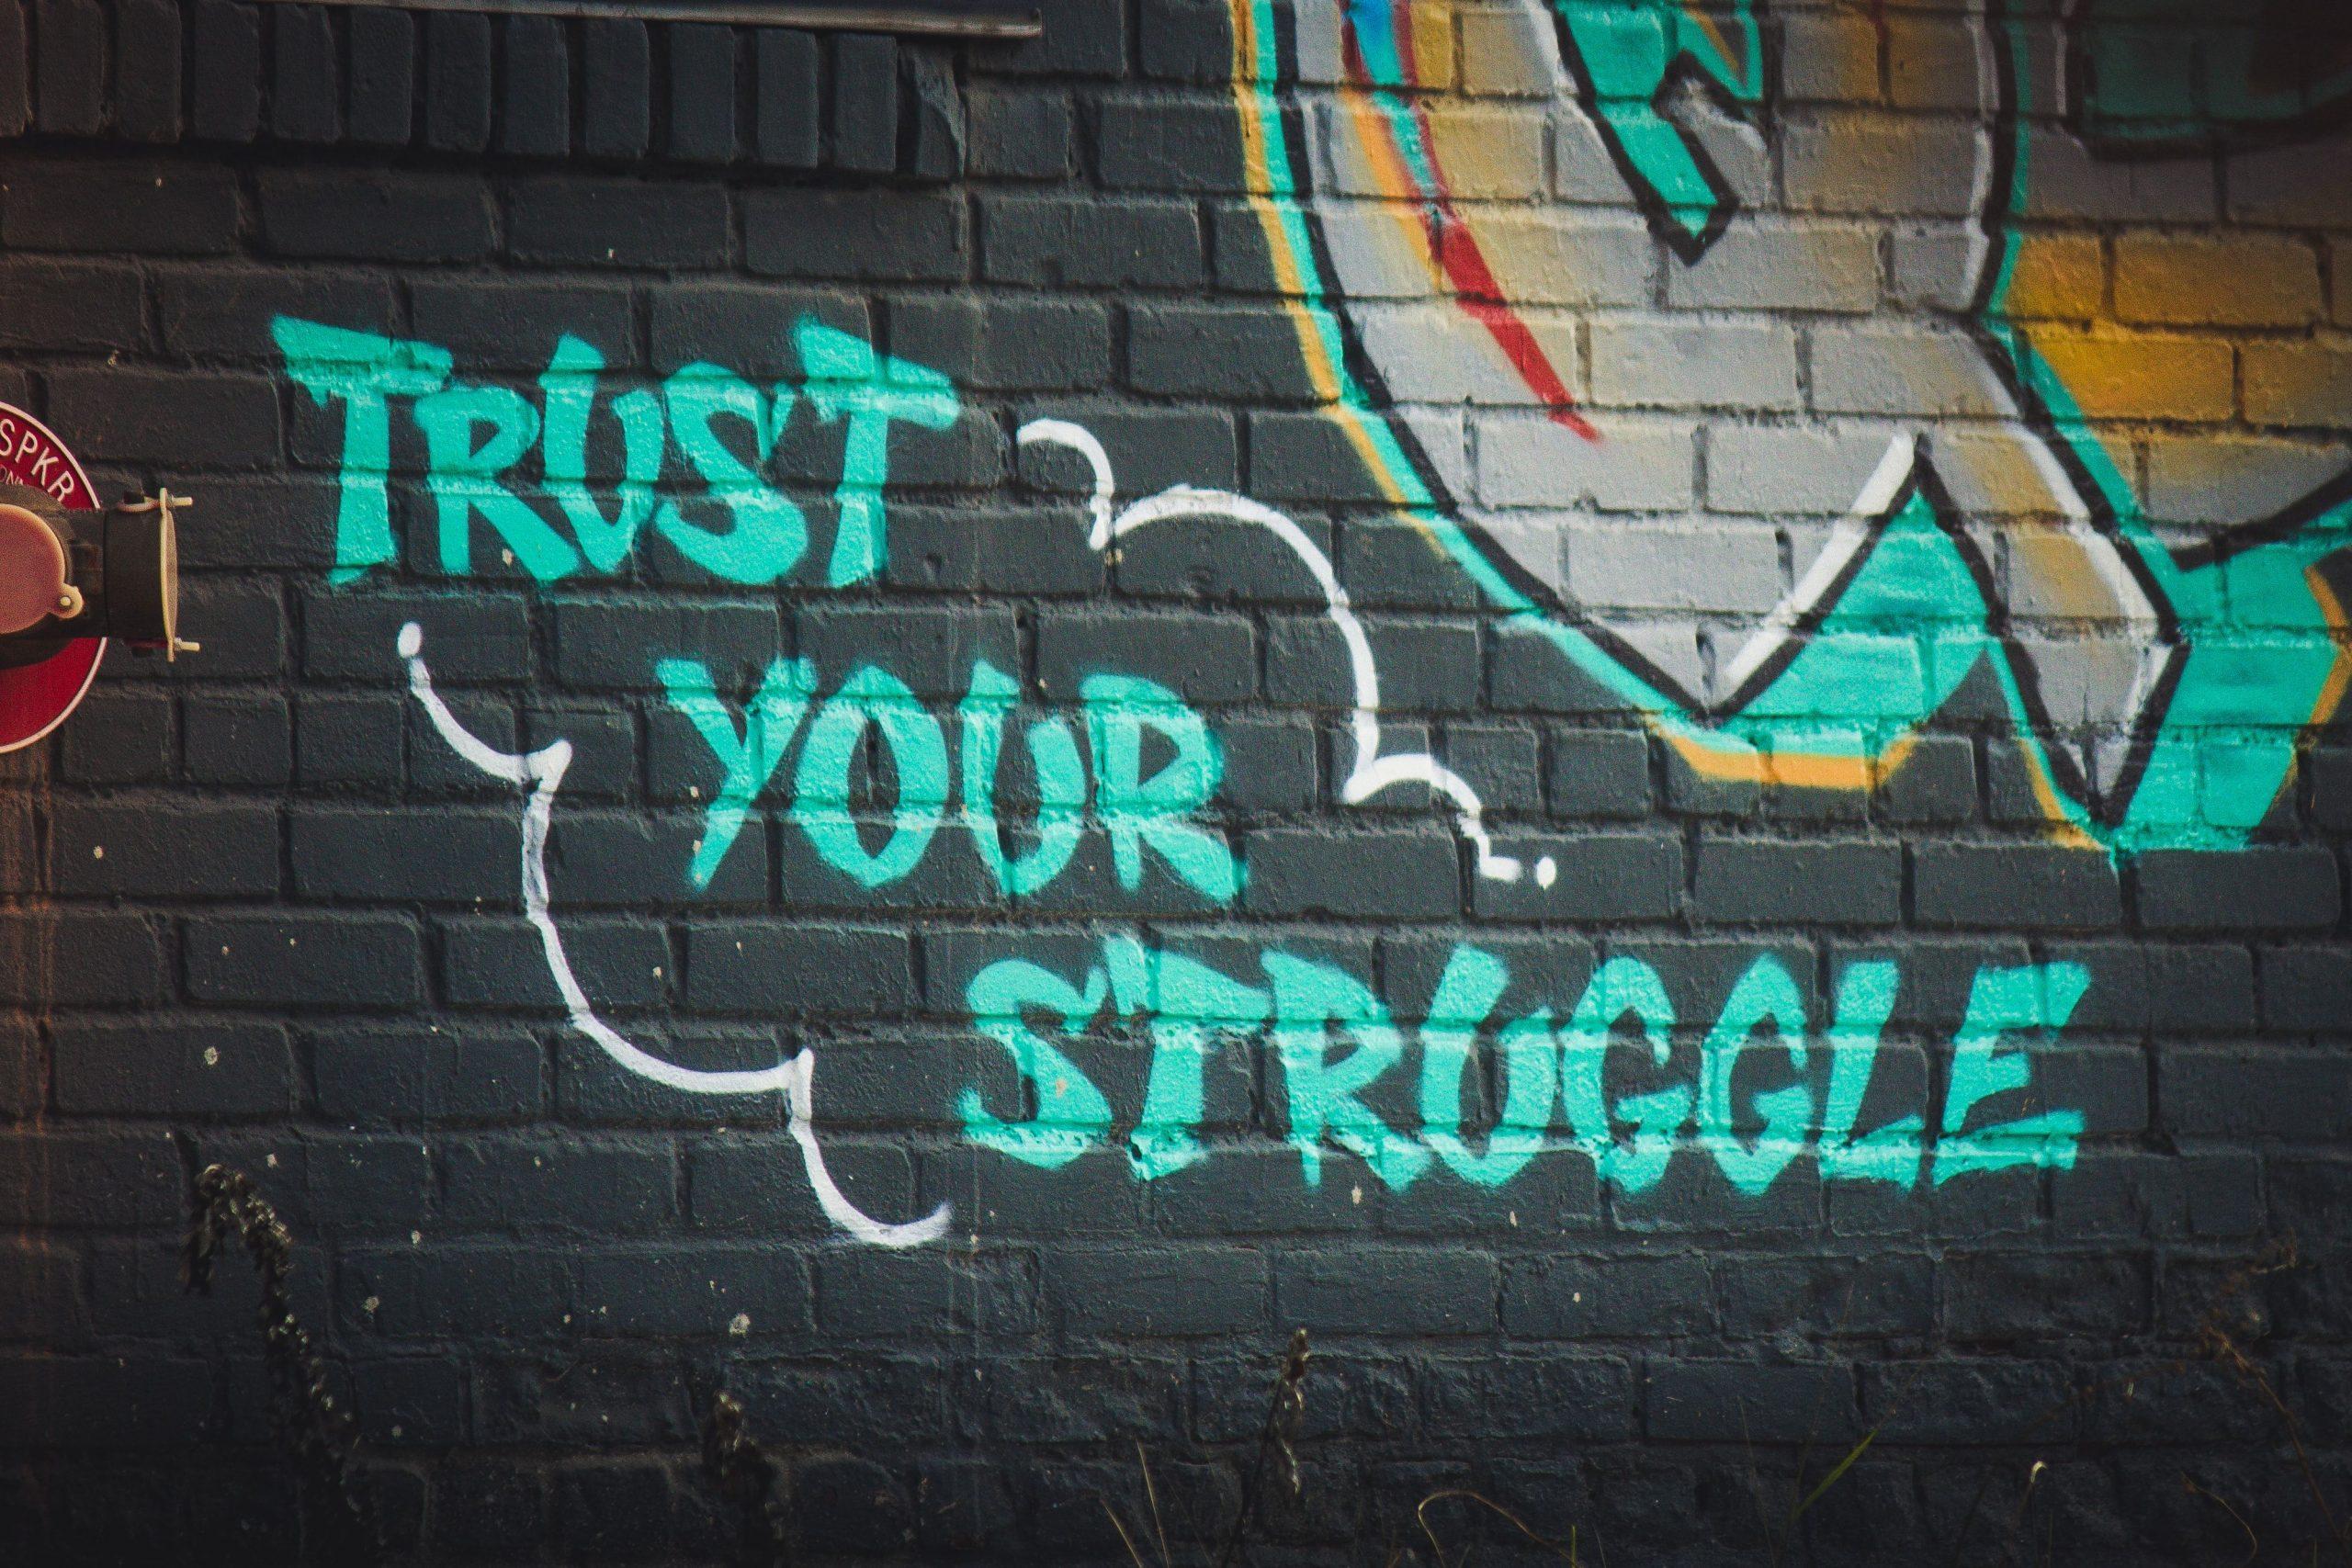 Struggle and Endurance